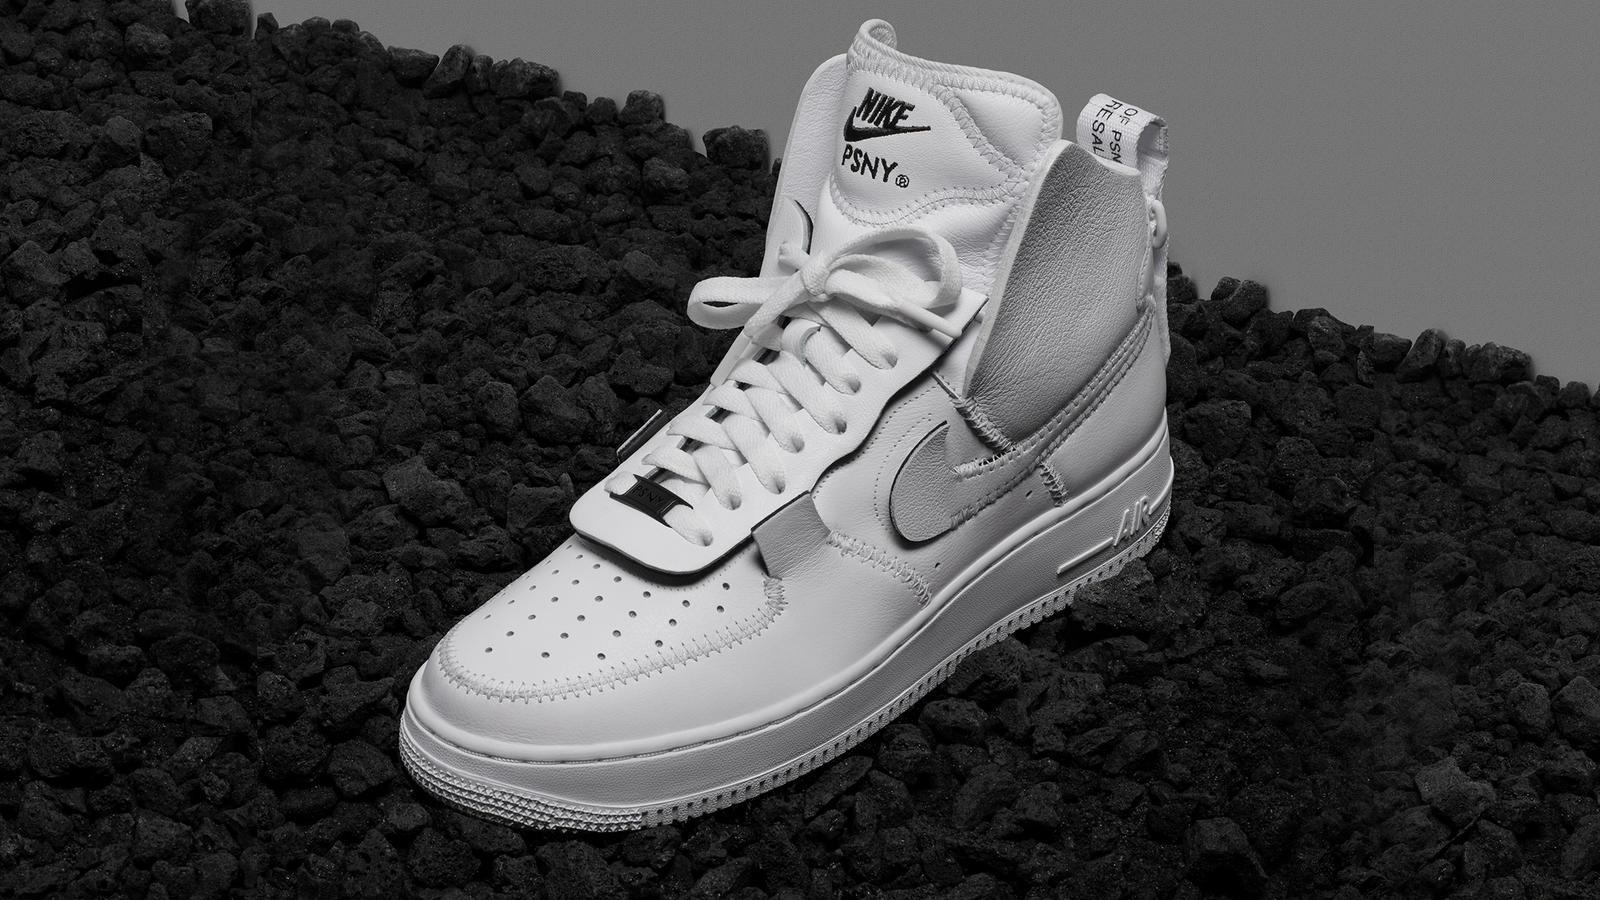 Nike_AF1_x_PSNY_White_original_hd_1600.jpg